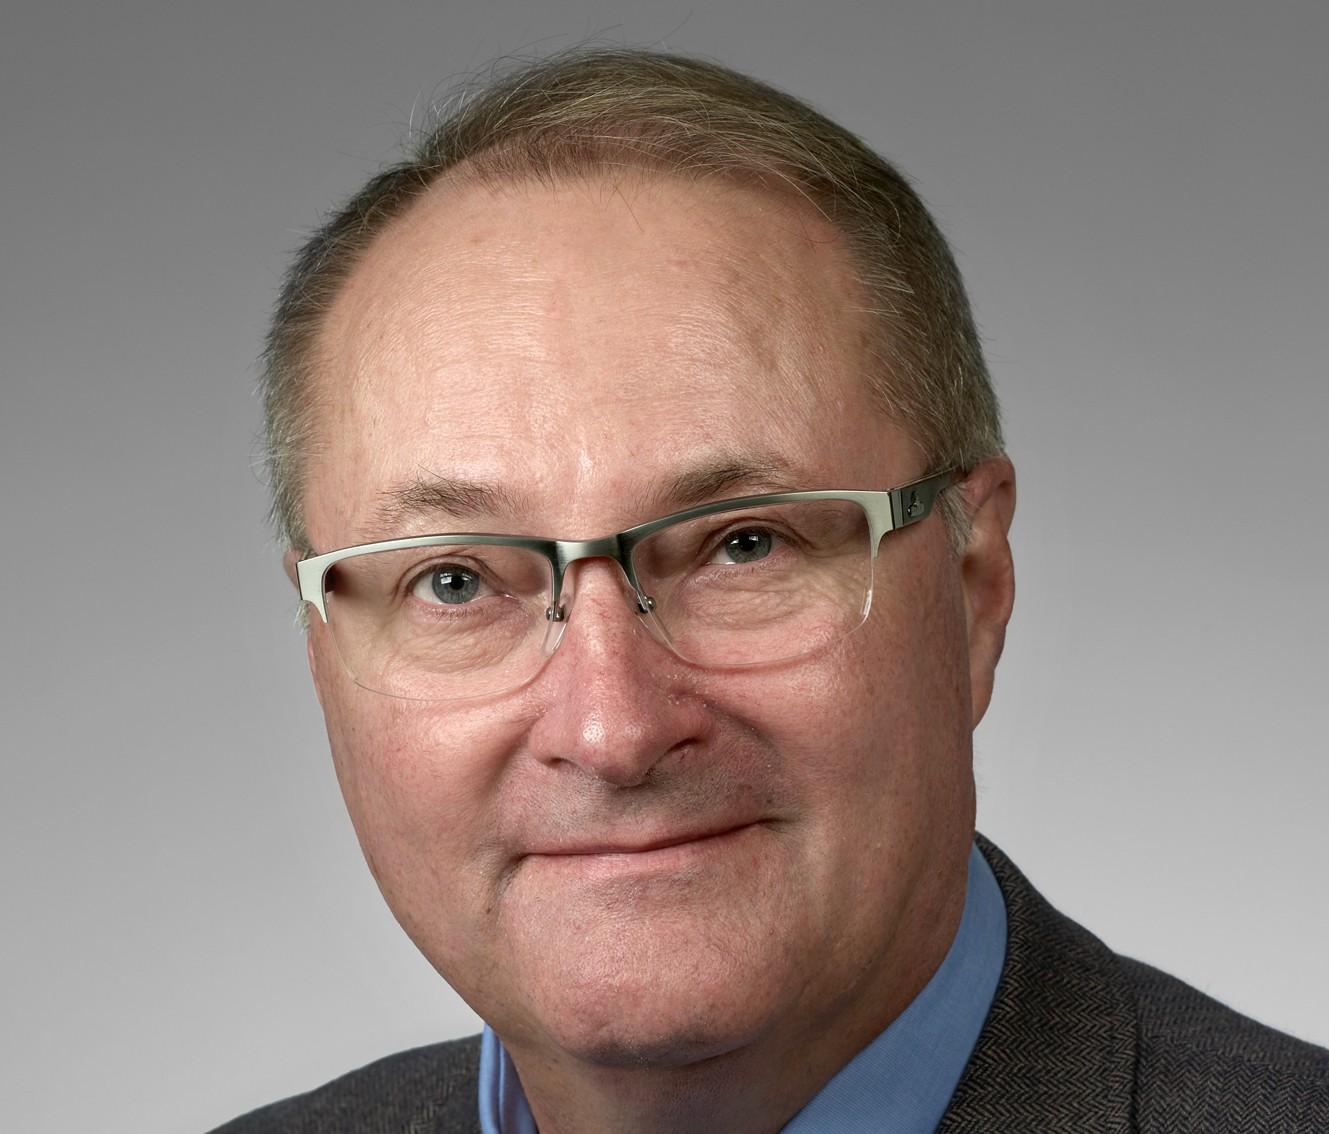 Juha Manner